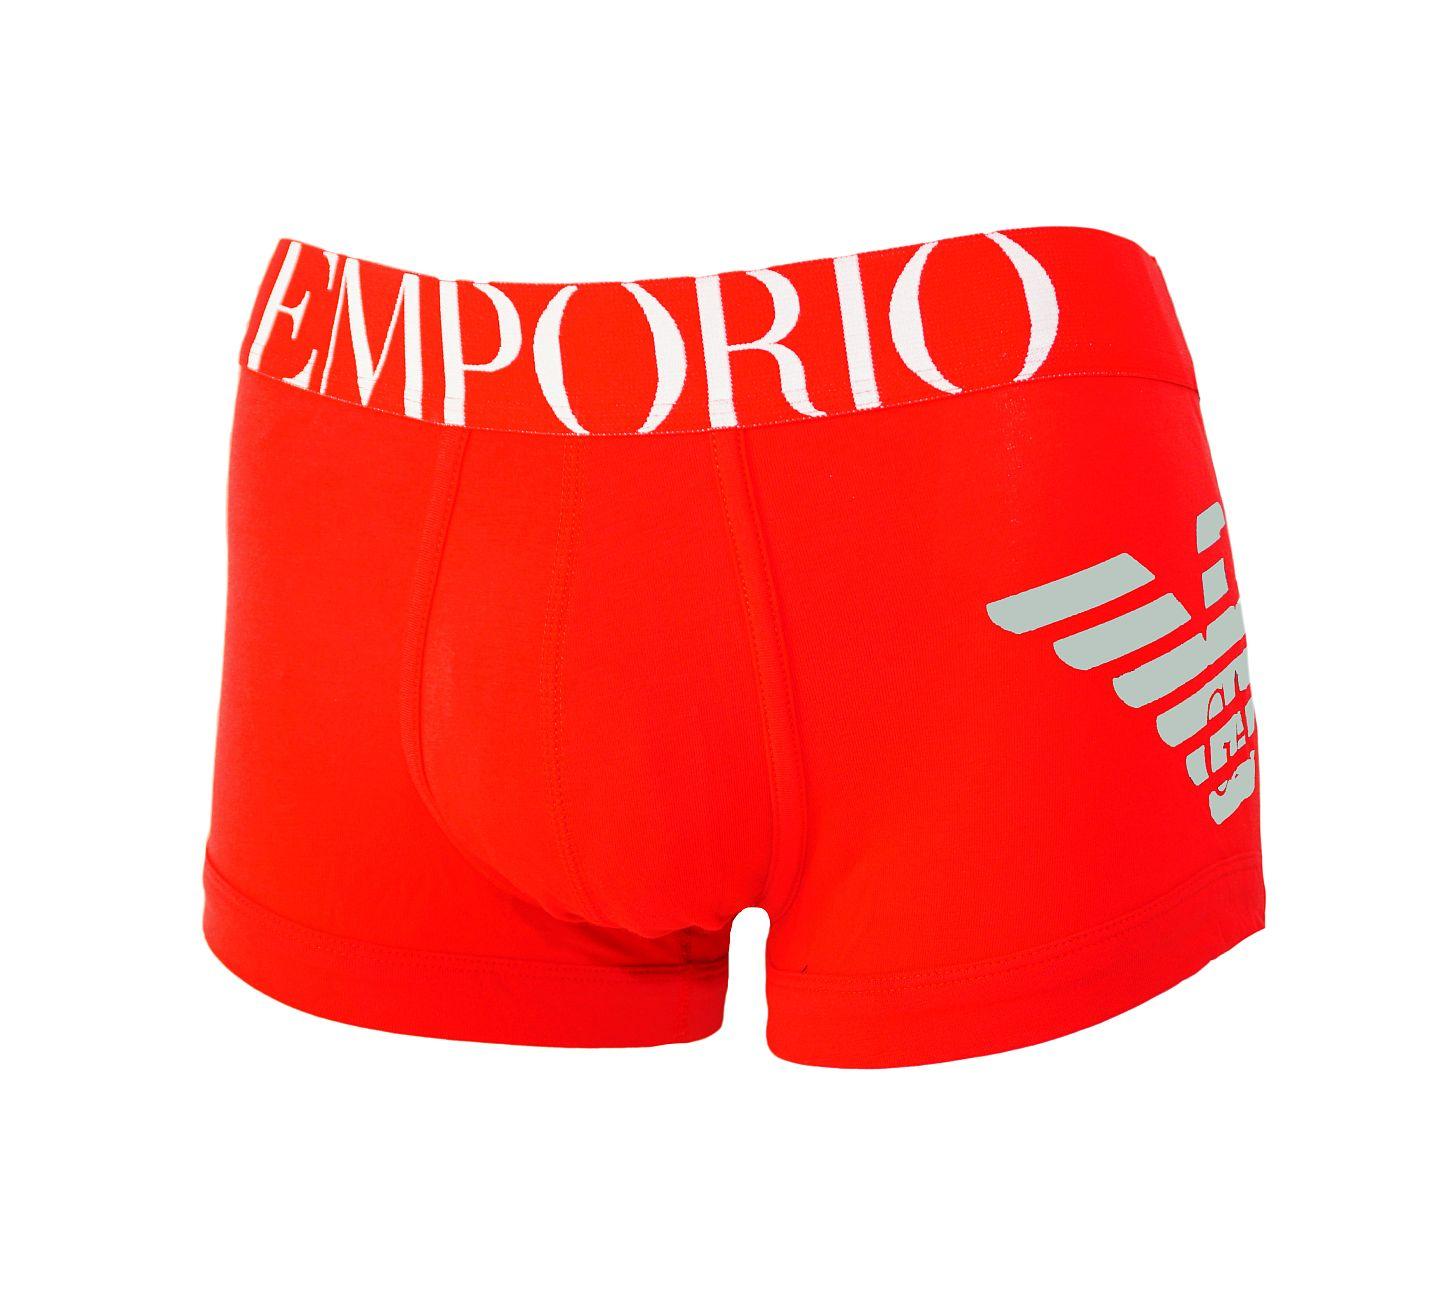 Emporio Armani Trunk Unterhose Short 111866 8P725 17574 TANGO RED F18-EAT2